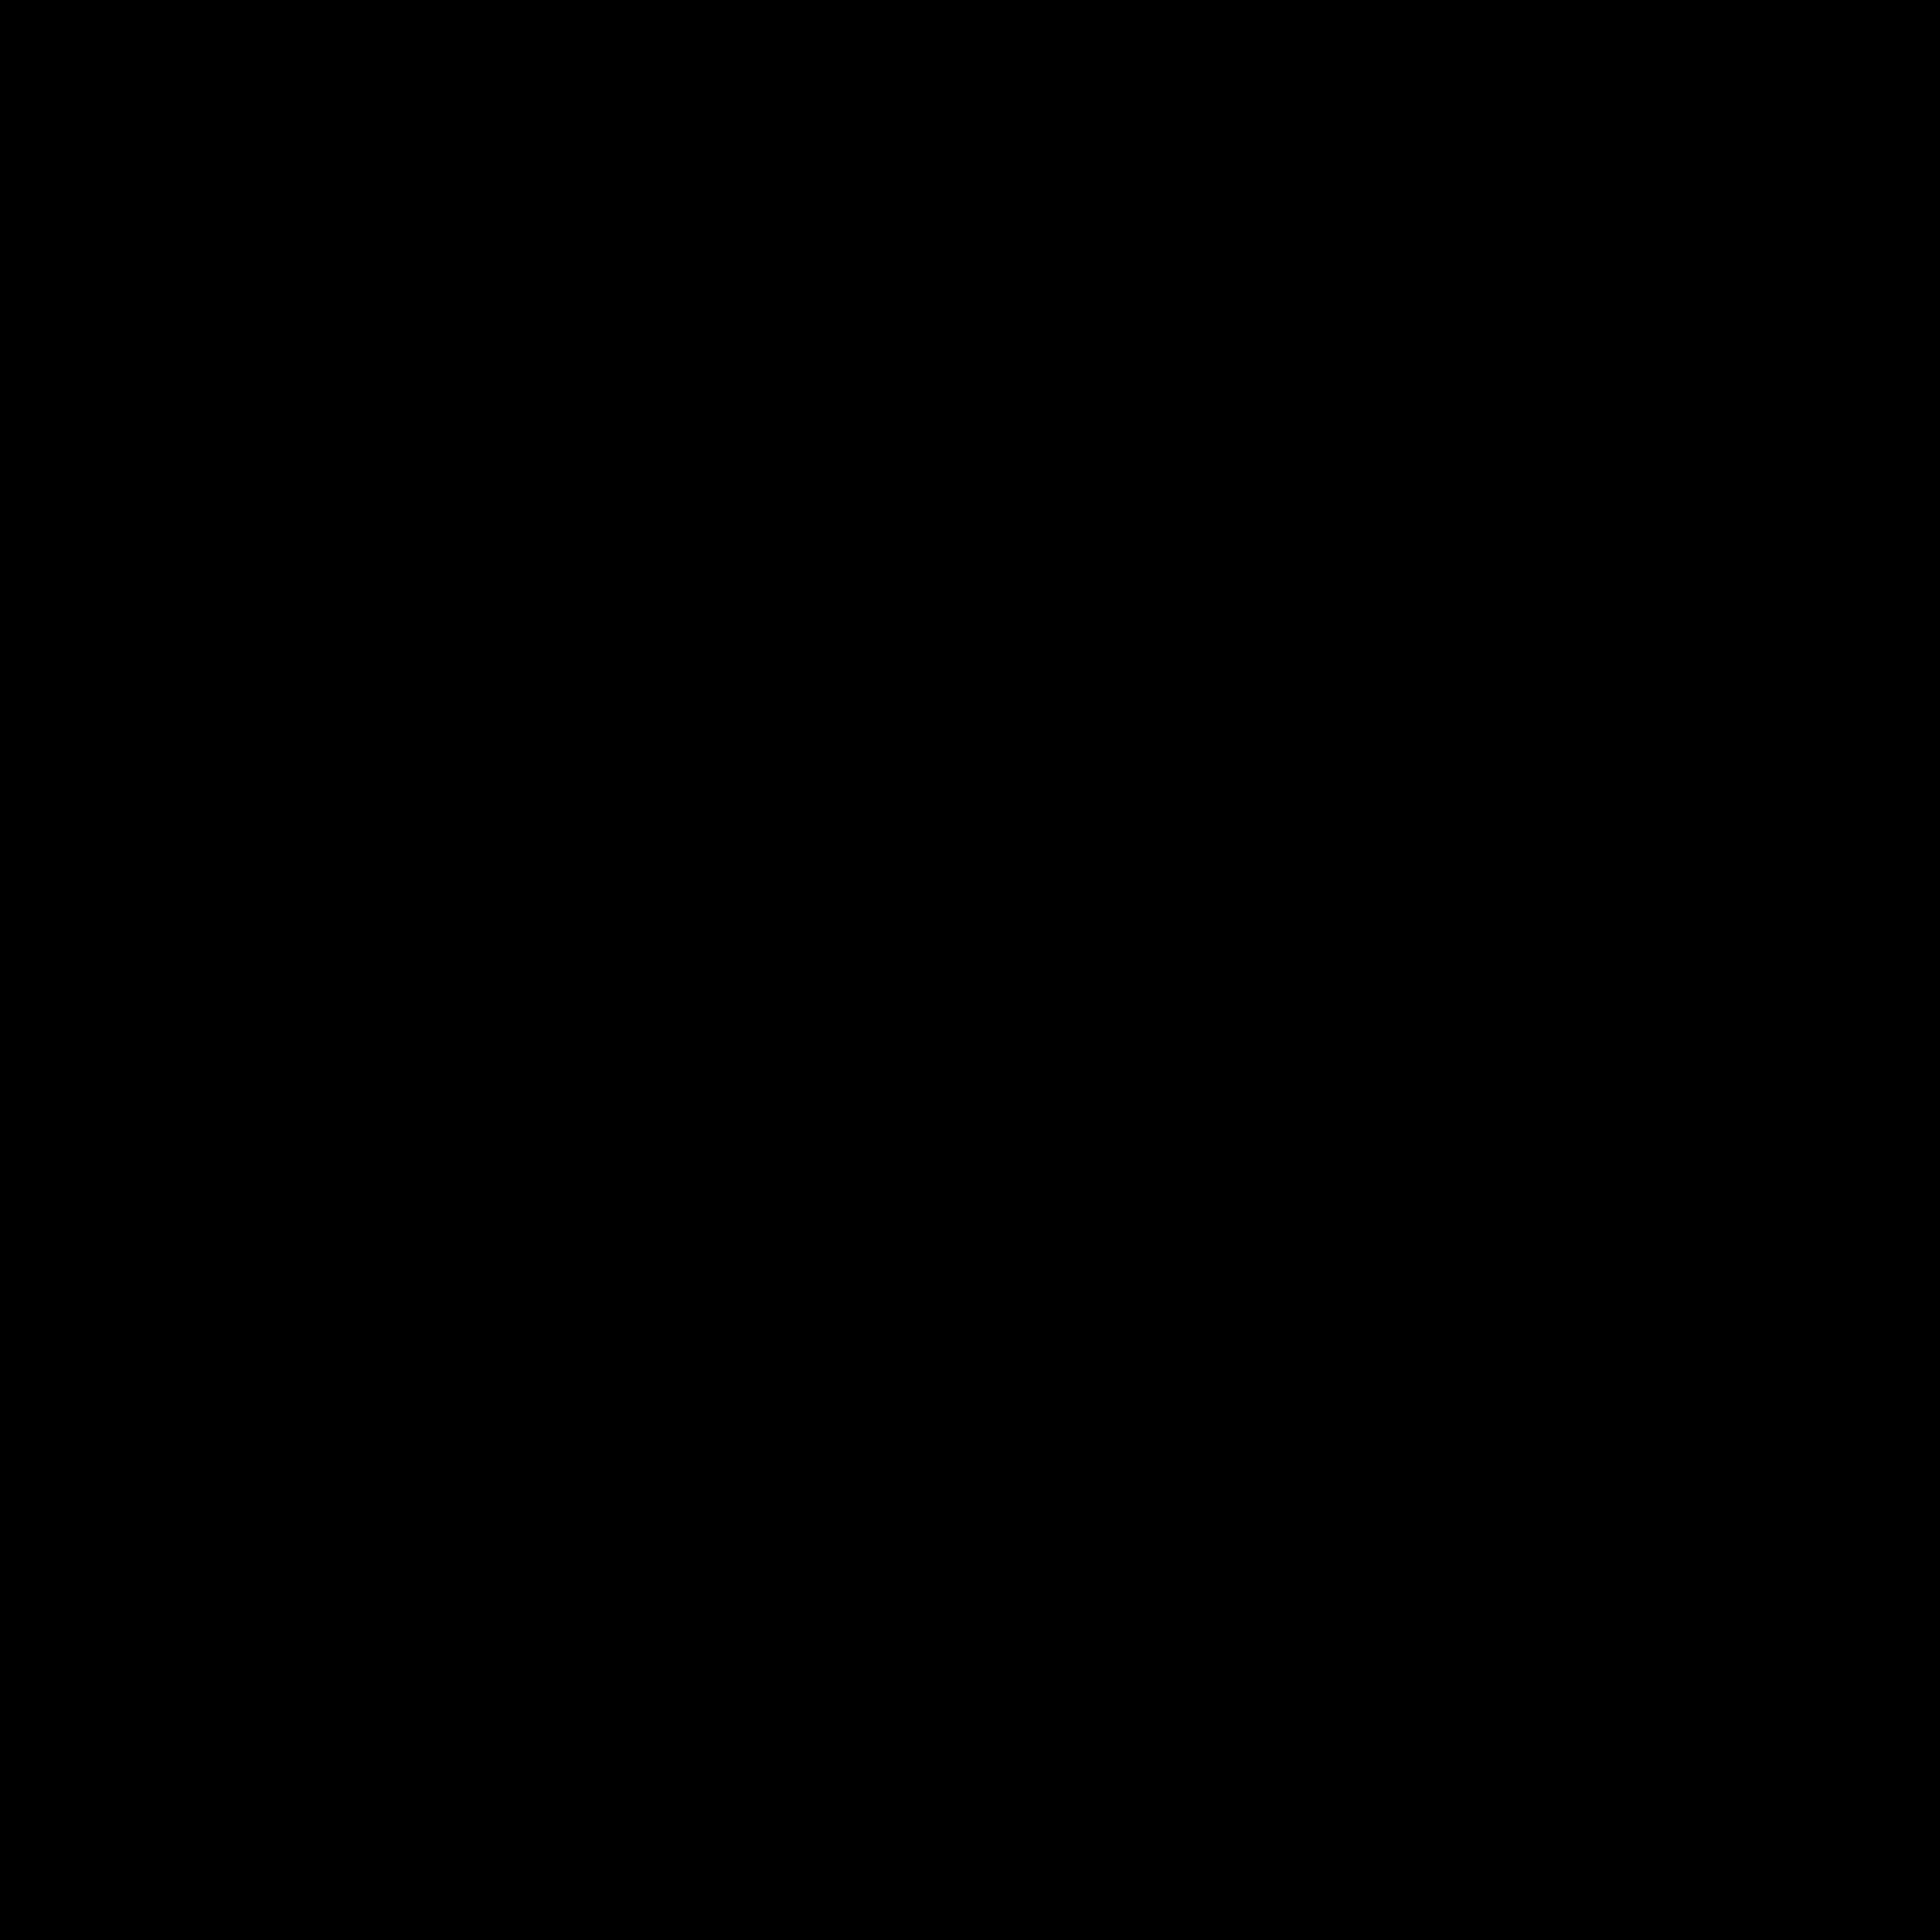 Graph clipart svg Graph File:Simpleicons bar rising